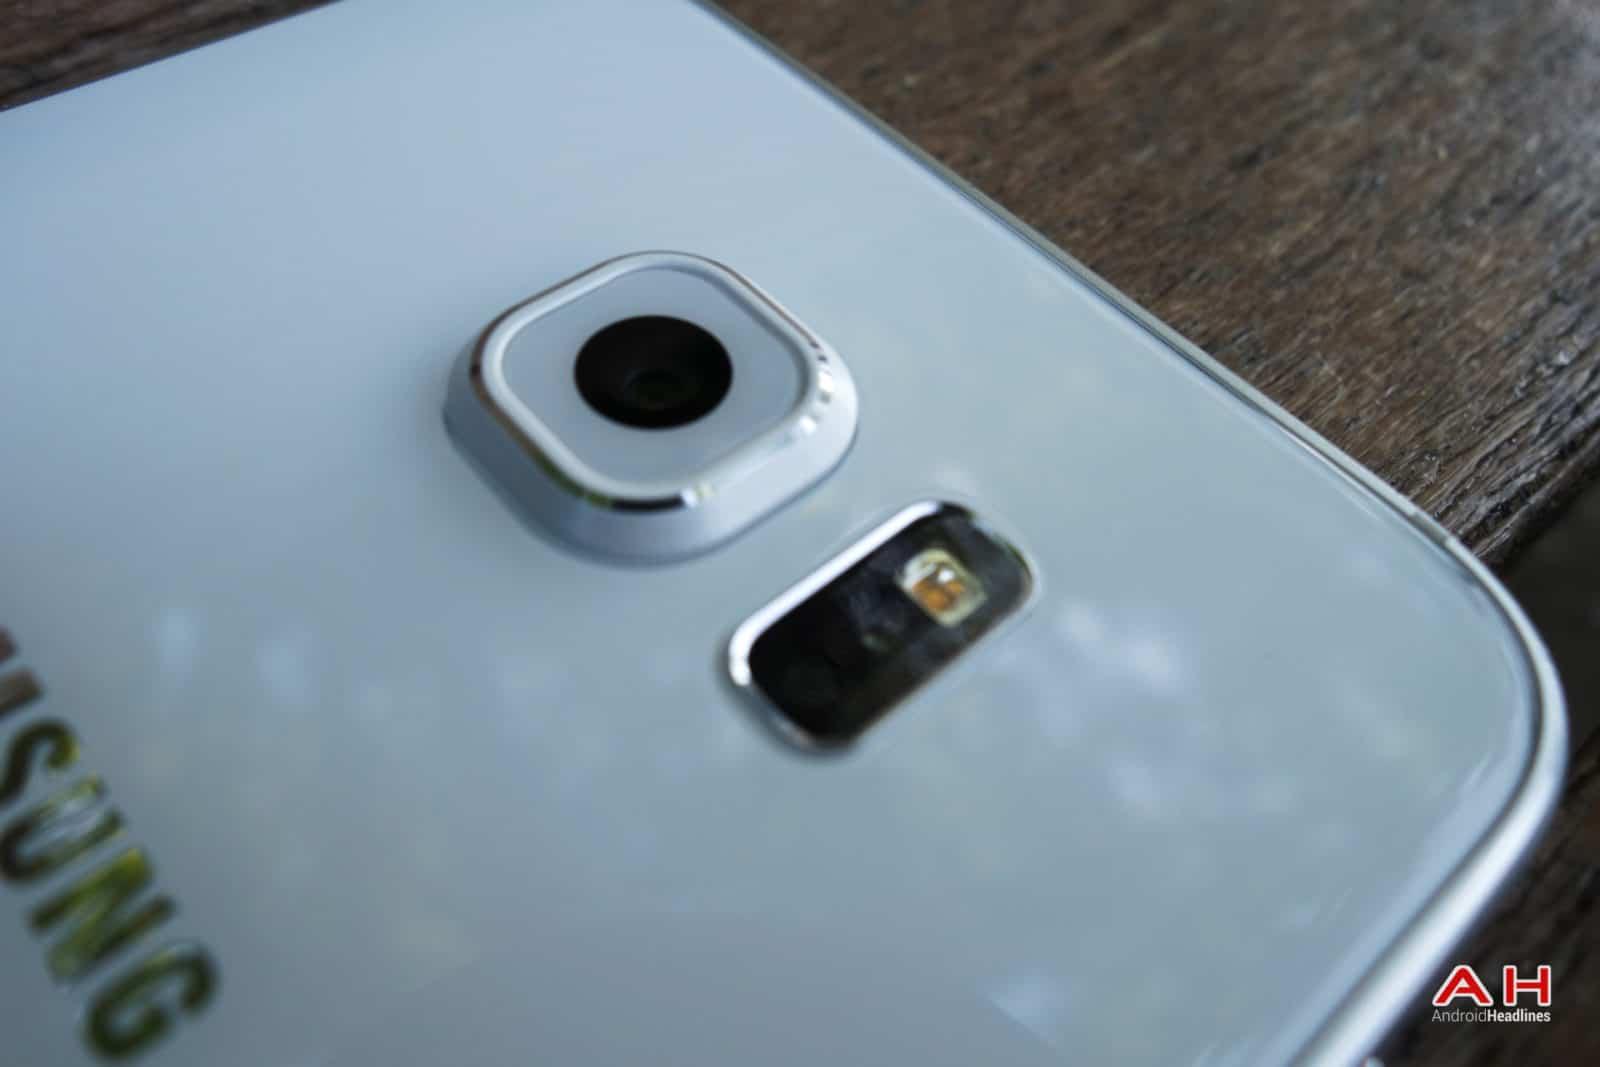 AH Samsung Galaxy S6-12